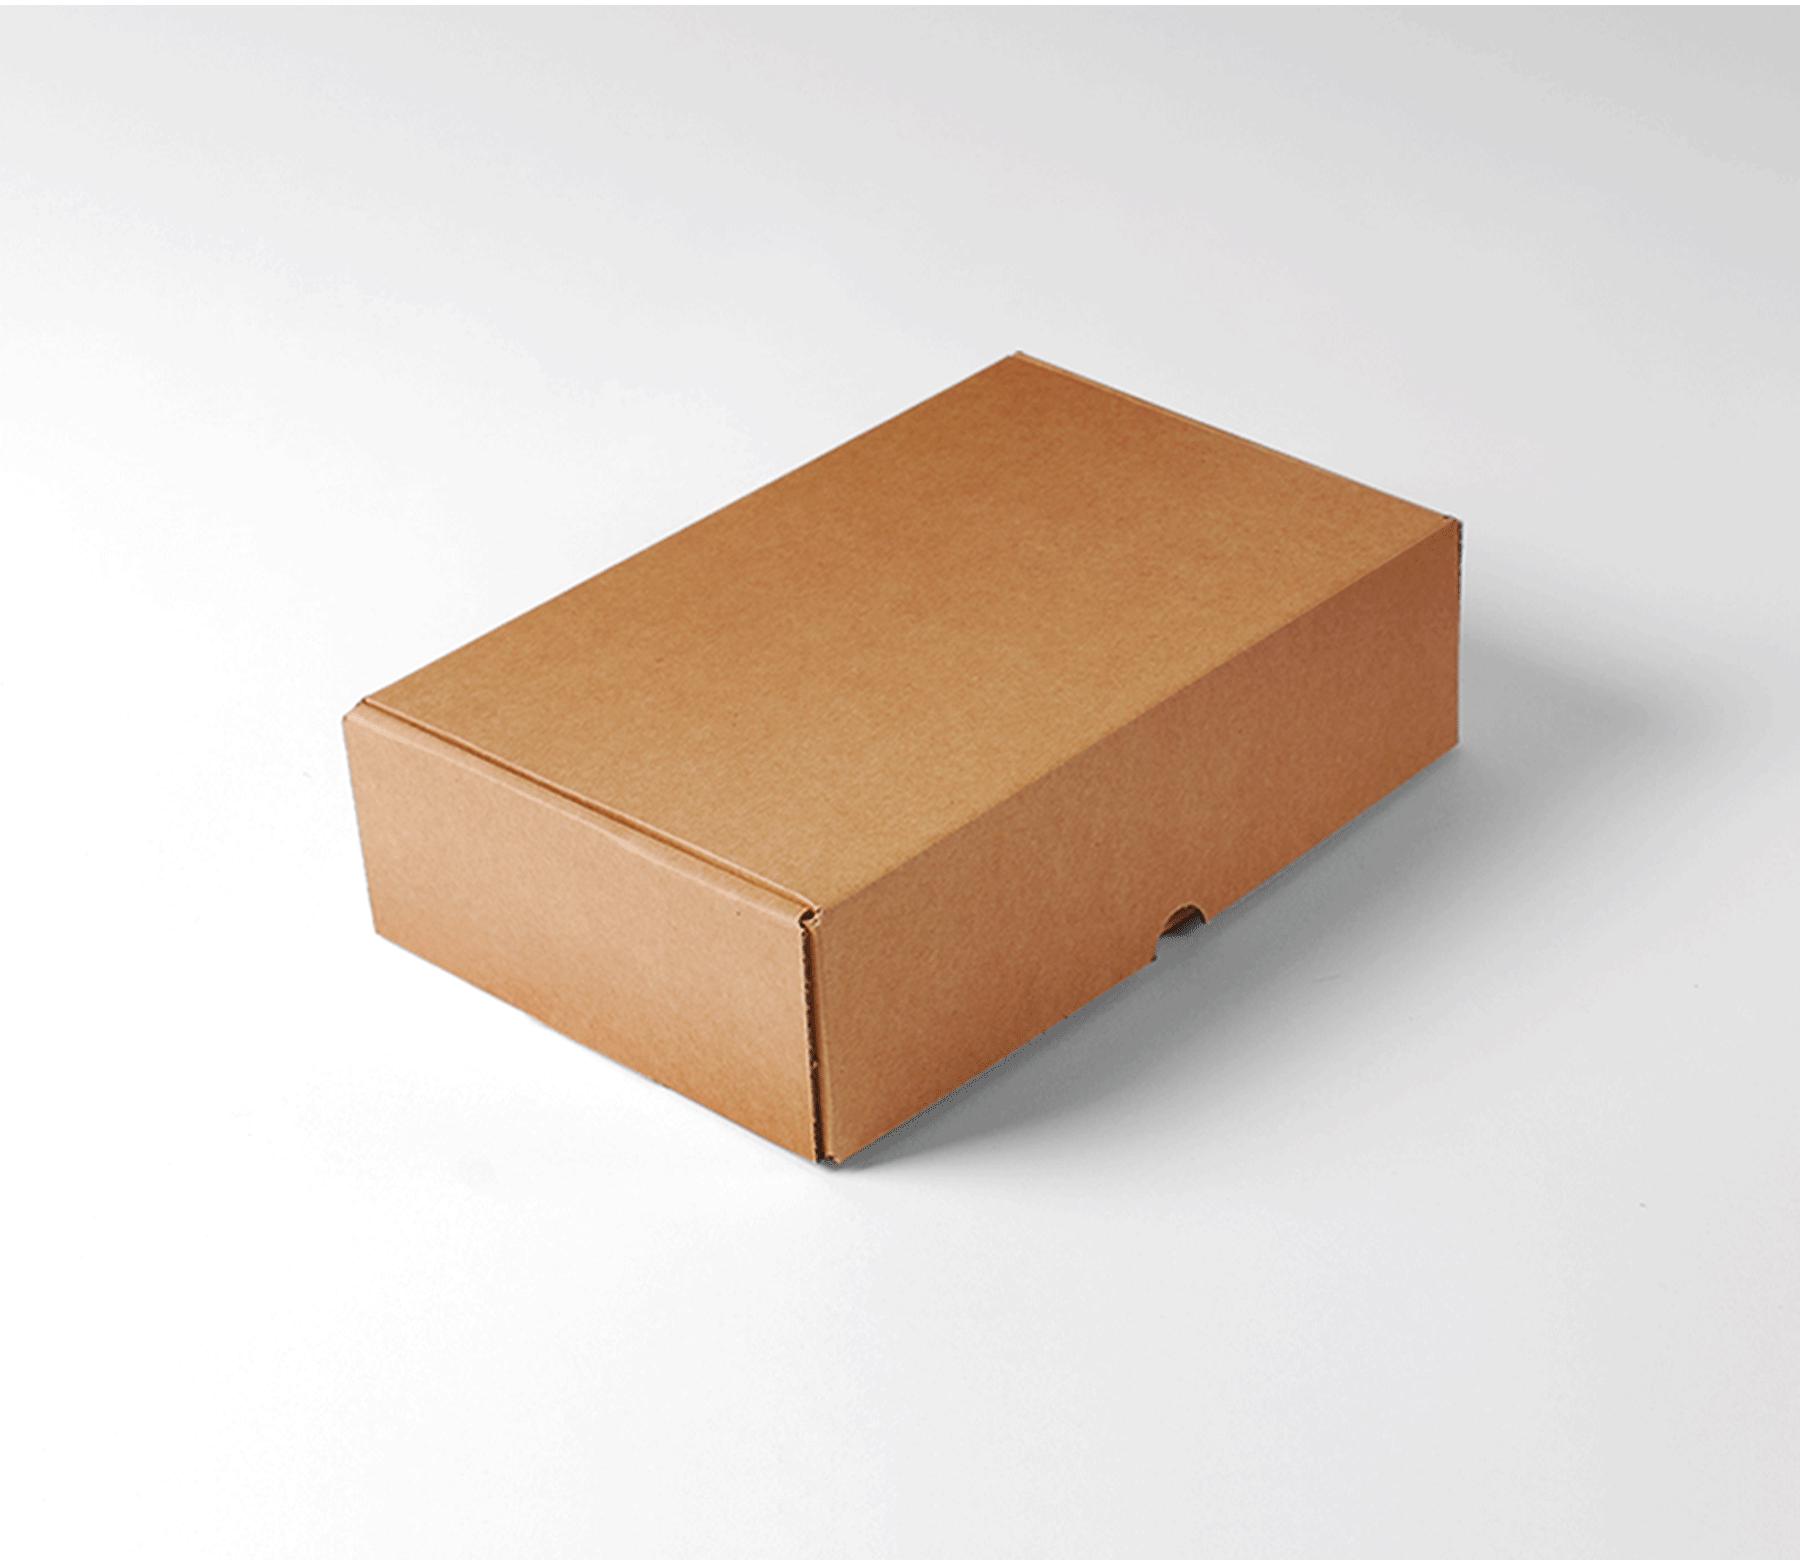 Self assembling rectangular box negle Image collections